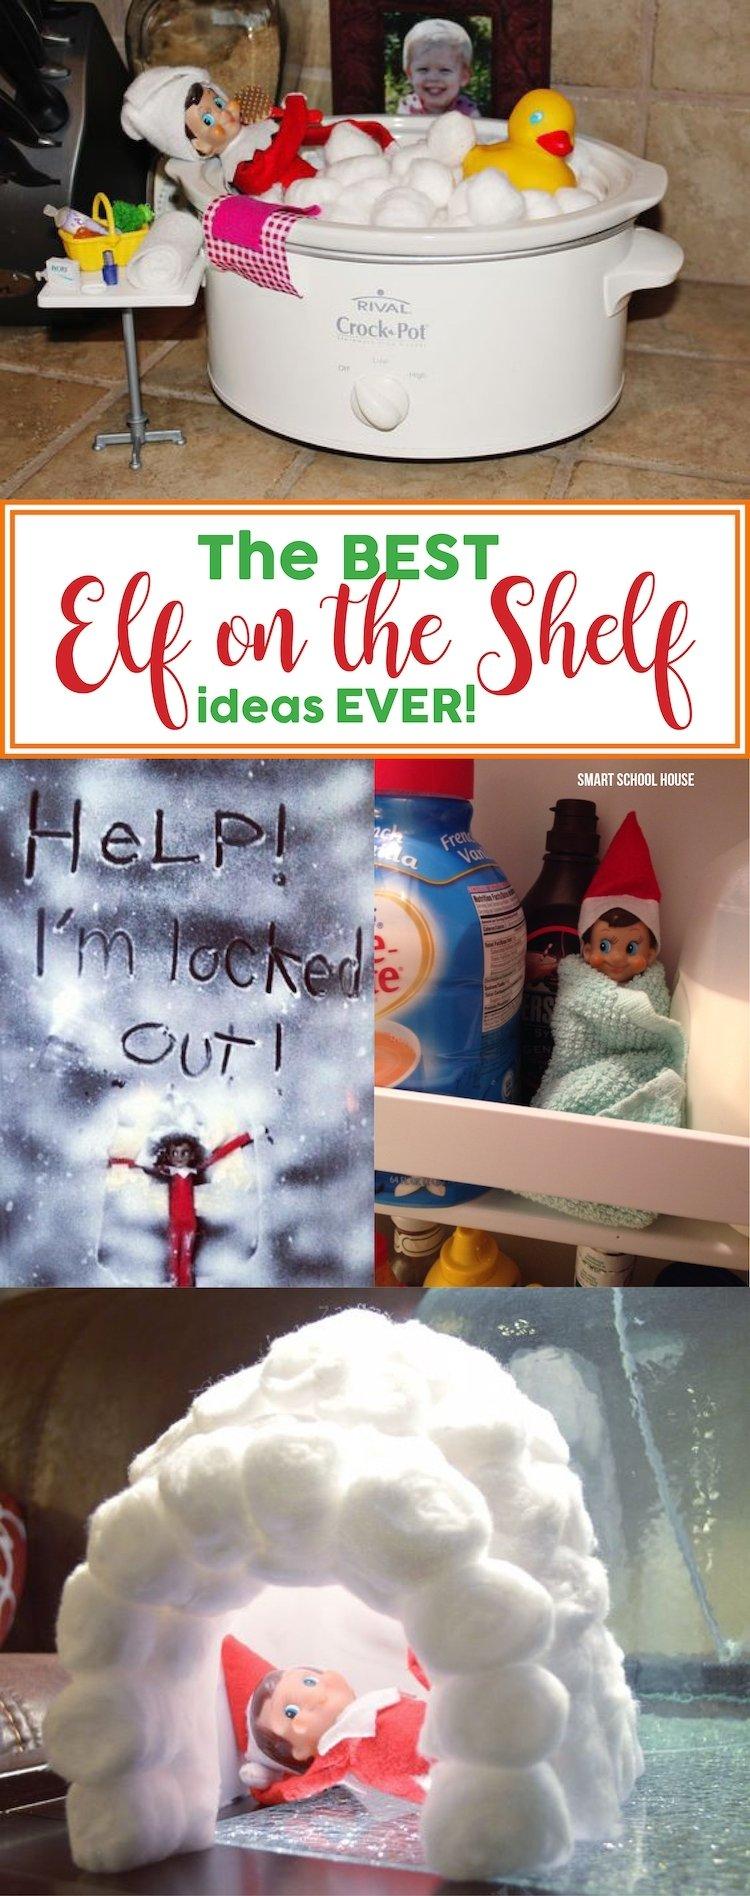 10 Cute Cool Ideas For Elf On The Shelf the best elf on the shelf ideas ever smart school house 1 2020